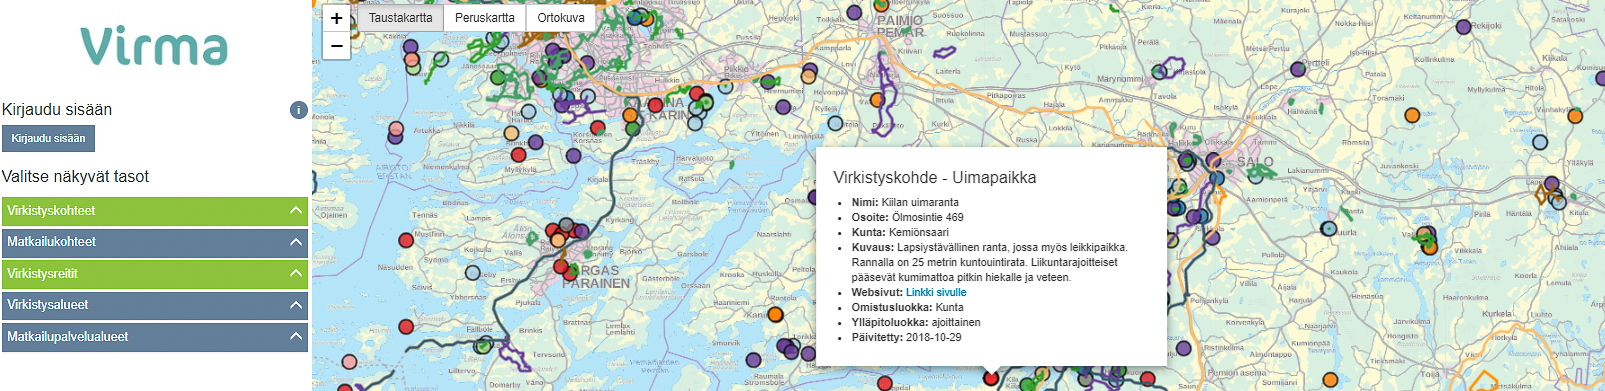 Kuvakappa Virmasta Kiilan uimaranta